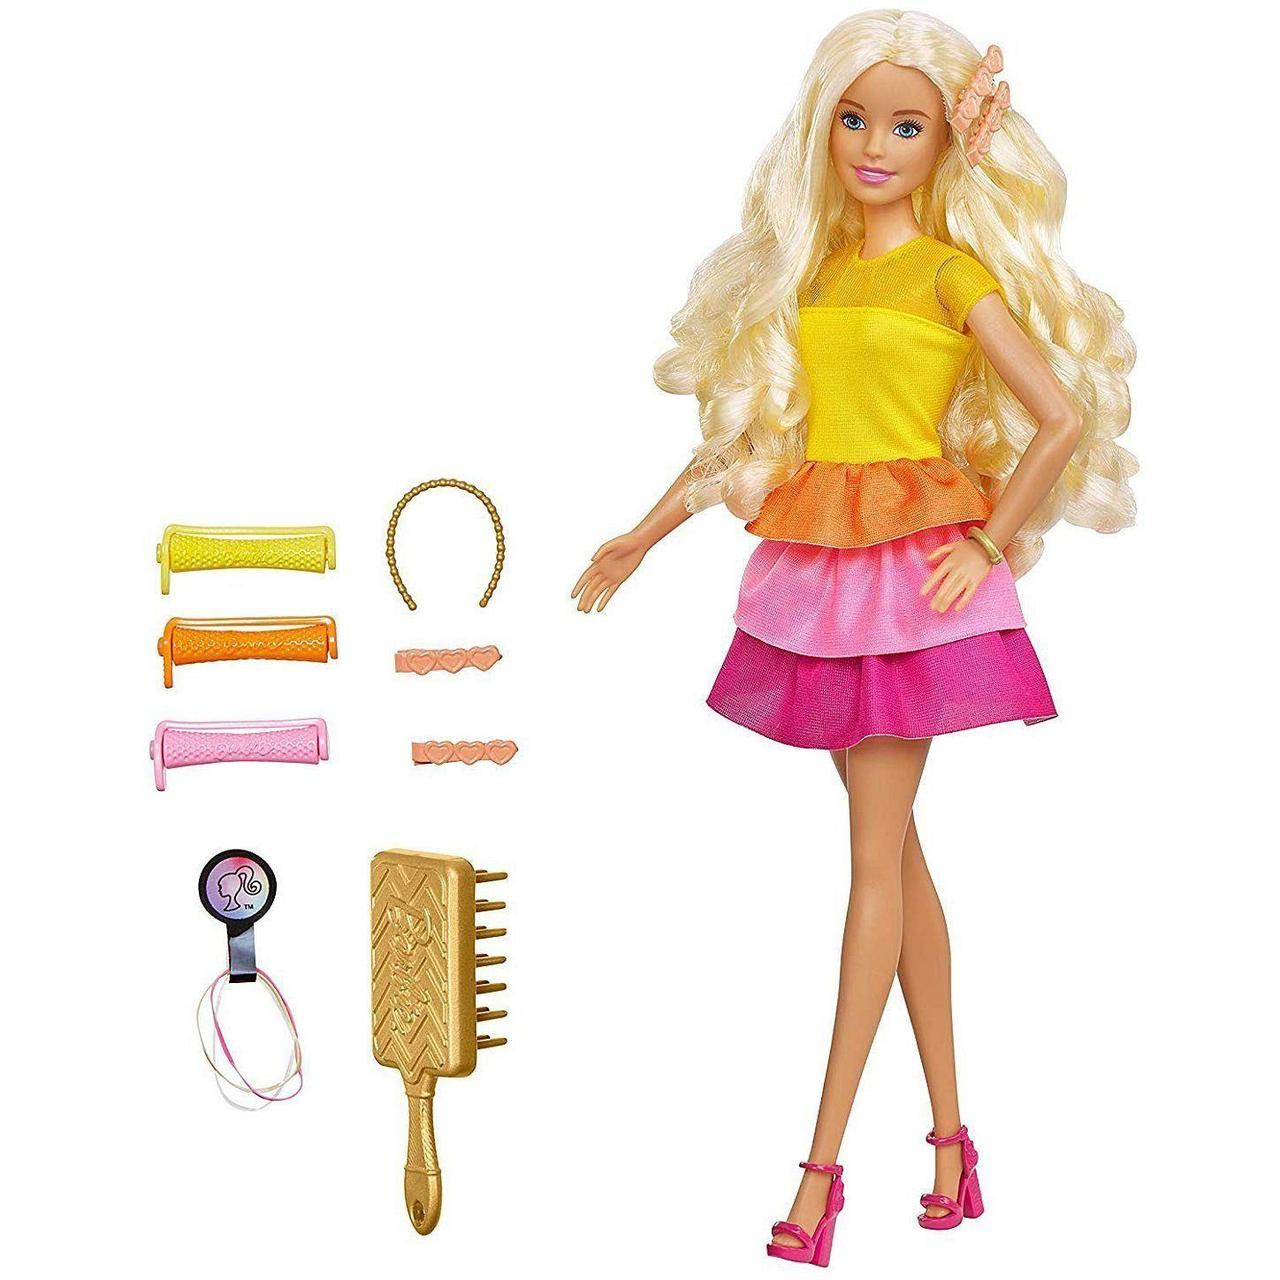 "Barbie Кукла с аксессуарами ""Барби Невероятные кудри"" Ultimate Curls GBK23 GBK24"